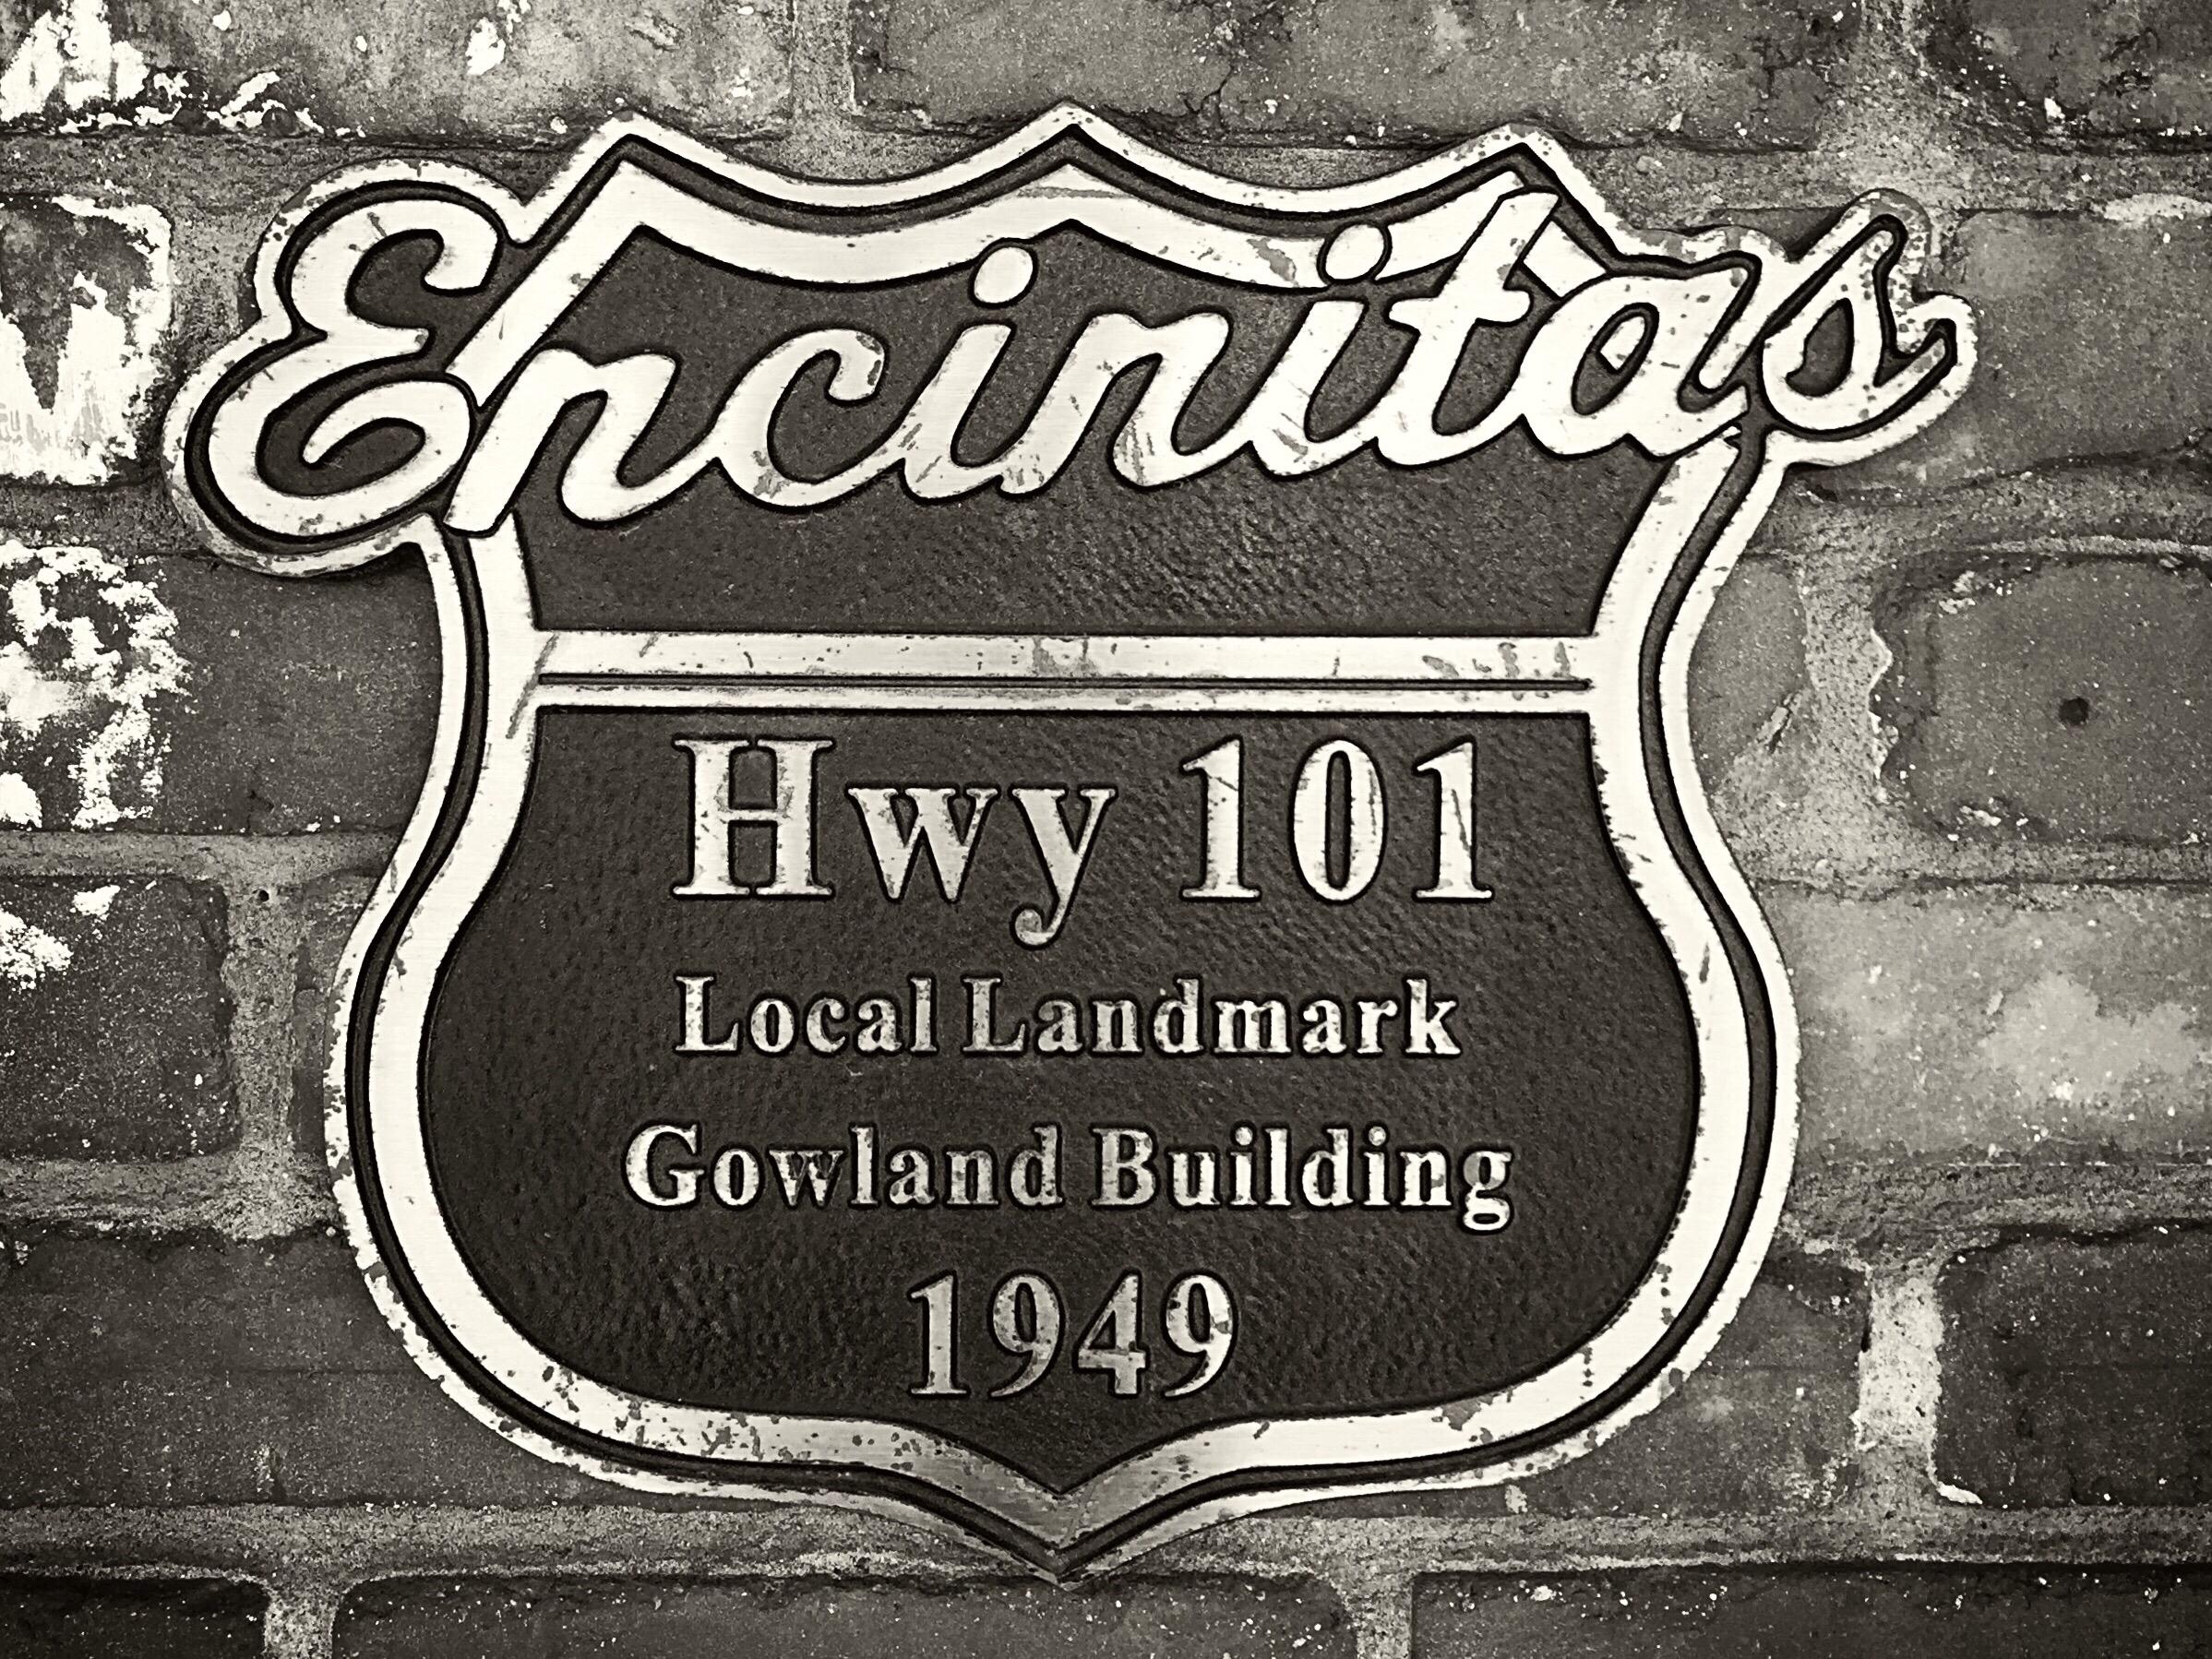 encinitas gowland building.jpg